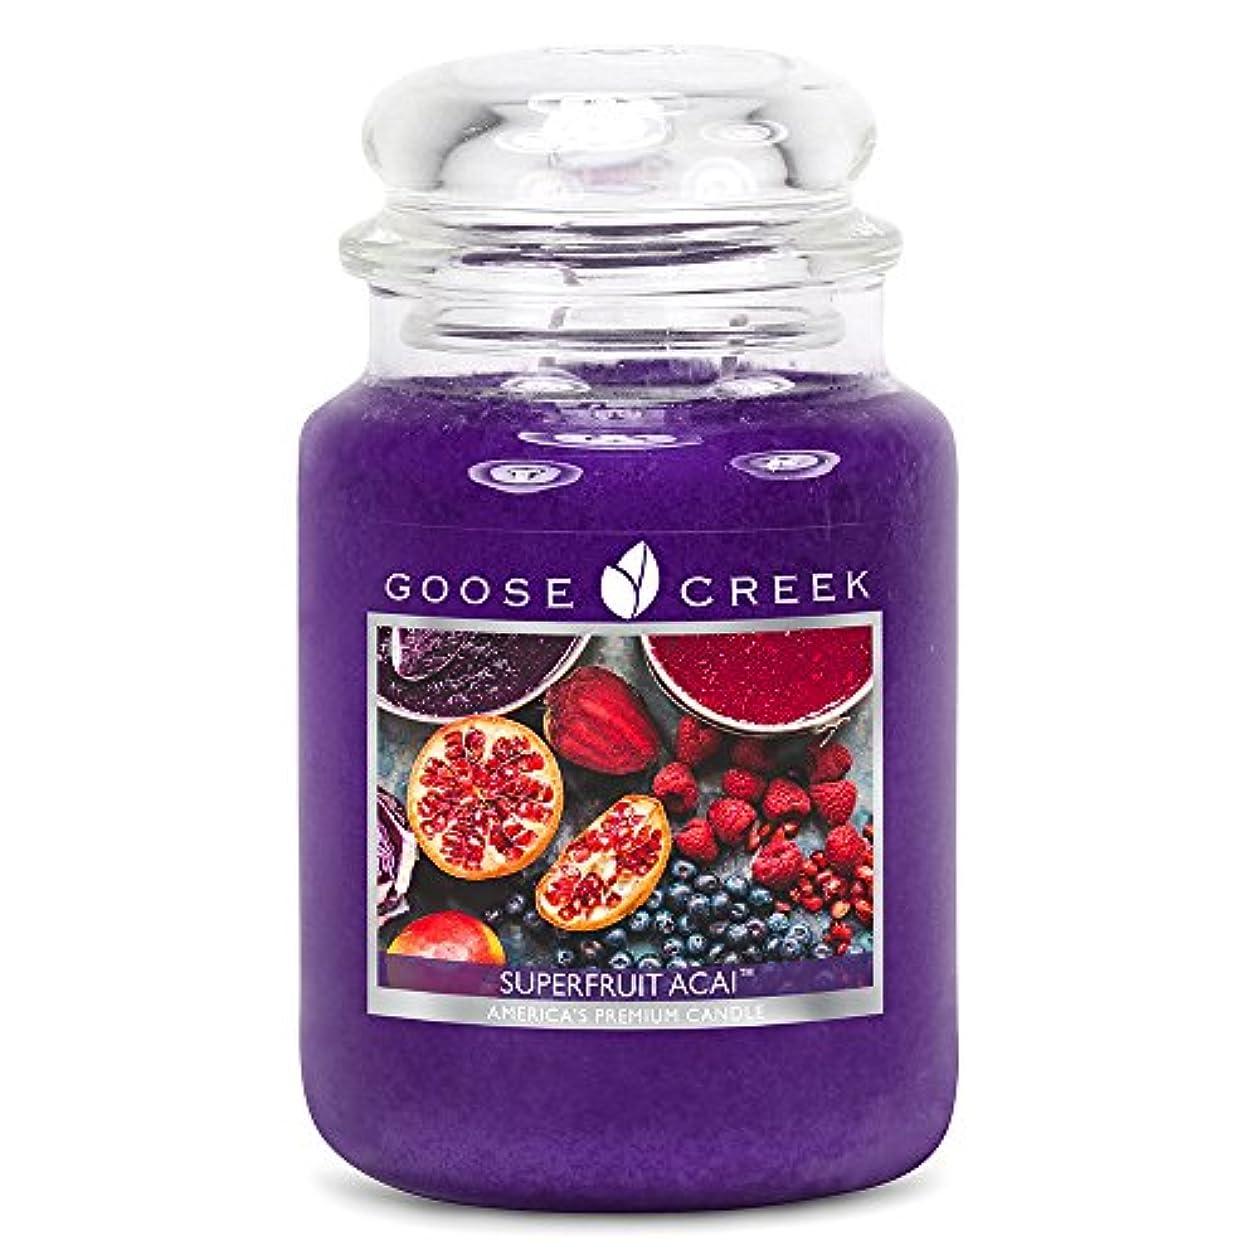 将来の雑草持続的Goose Creek ES24570 24 oz Essential Superfruit Acai Jar Candle